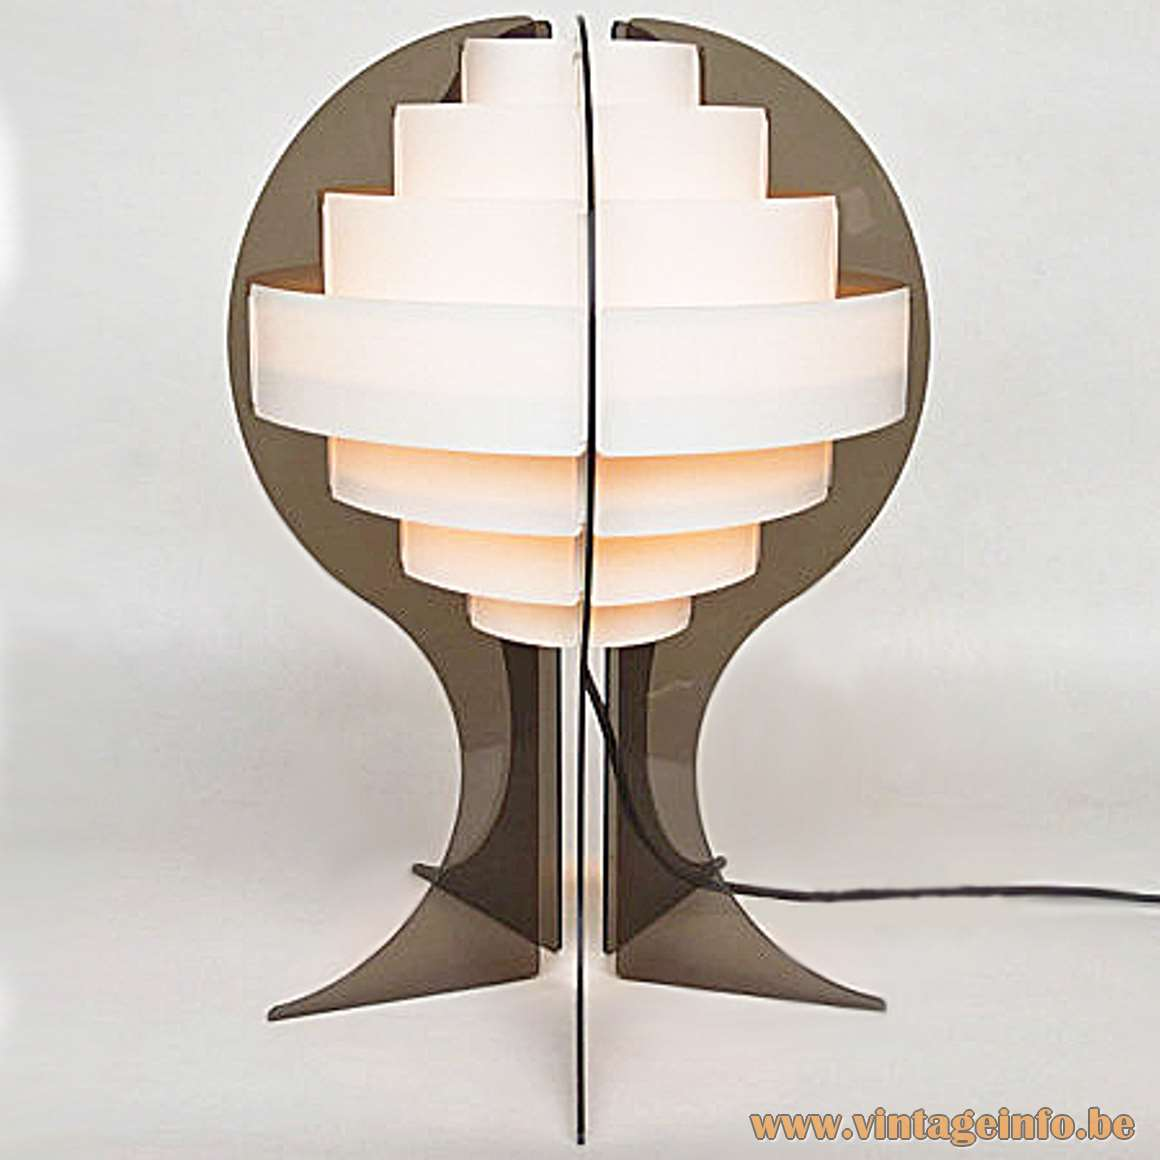 Strips Table Lamp smoked acrylic white PVC plastic round lampshade 1960s Designers: Flemming Brylle Preben Jacobsen